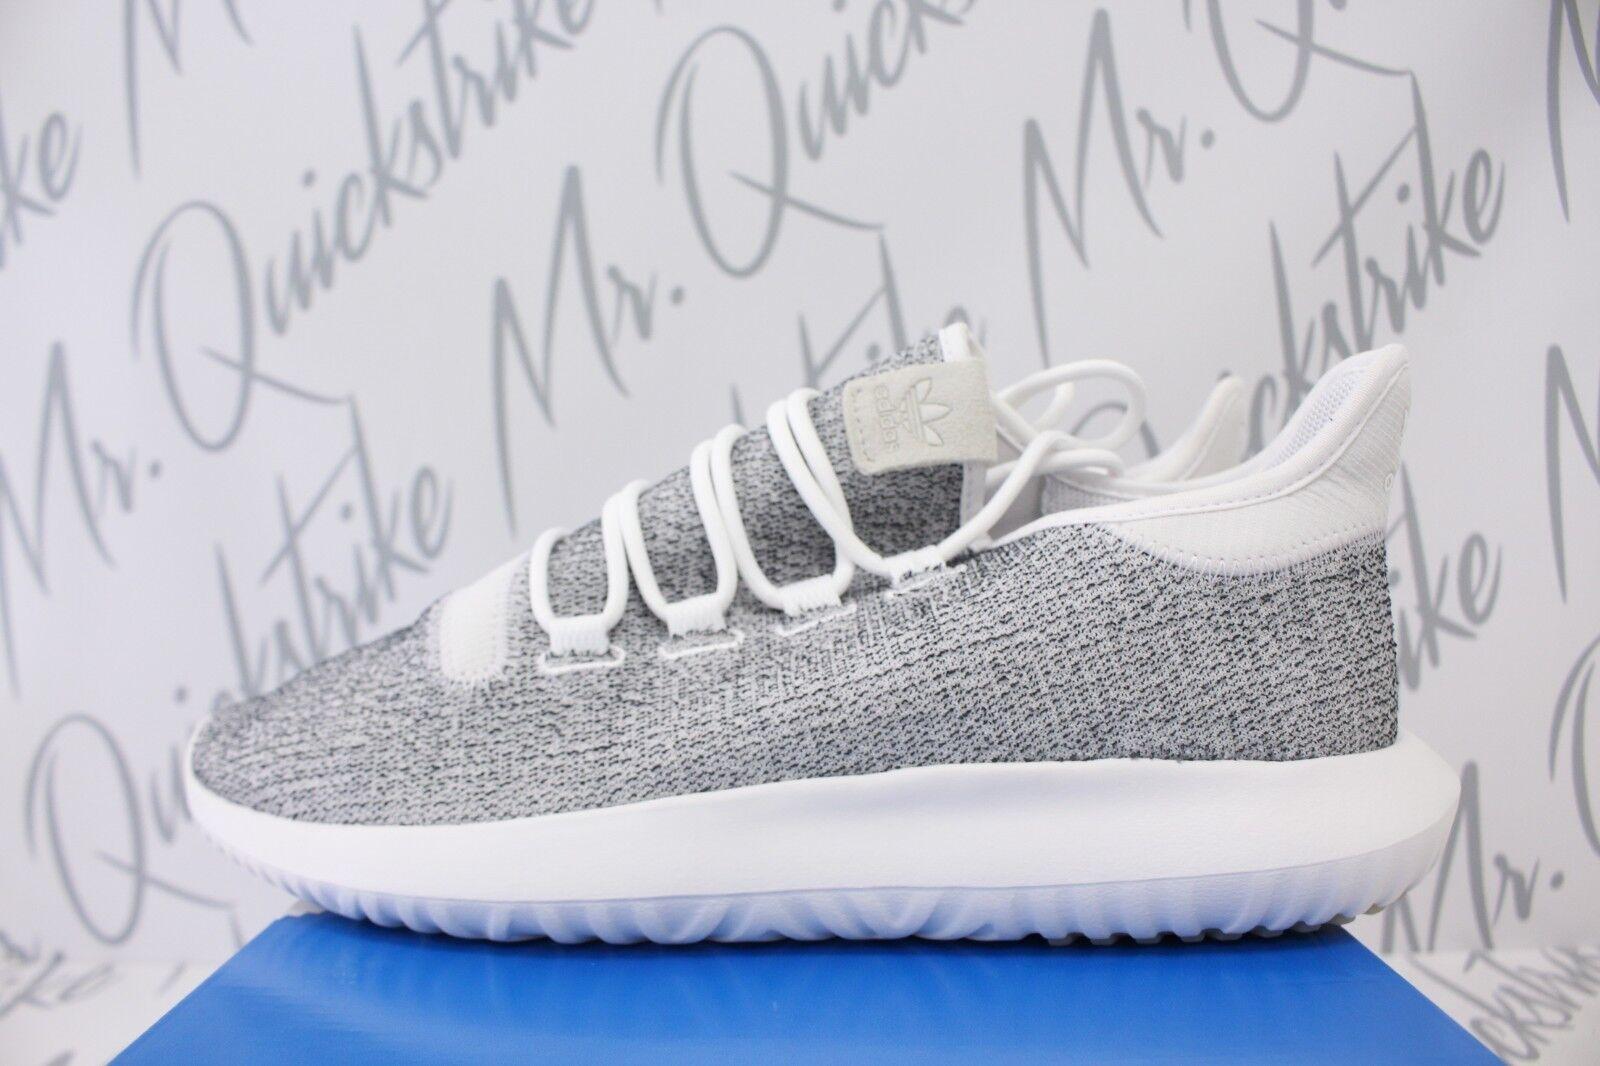 Adidas Originales sombra tubular talle 11.5 blancoo gris blancoo CQ0928